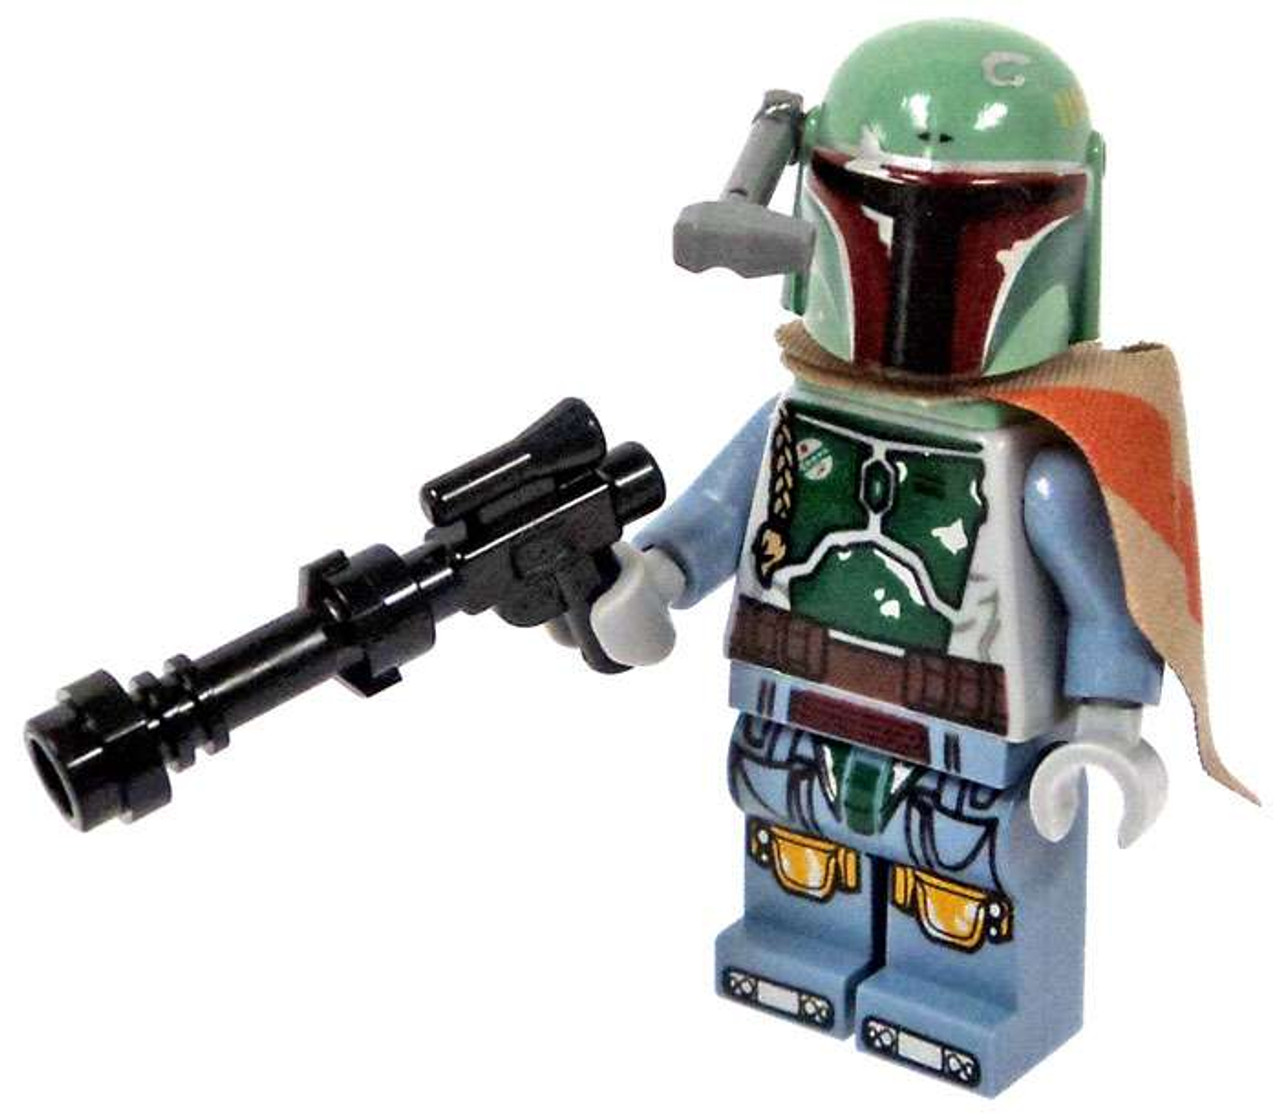 Lego Star Wars Empire Strikes Back Loose Boba Fett Minifigure